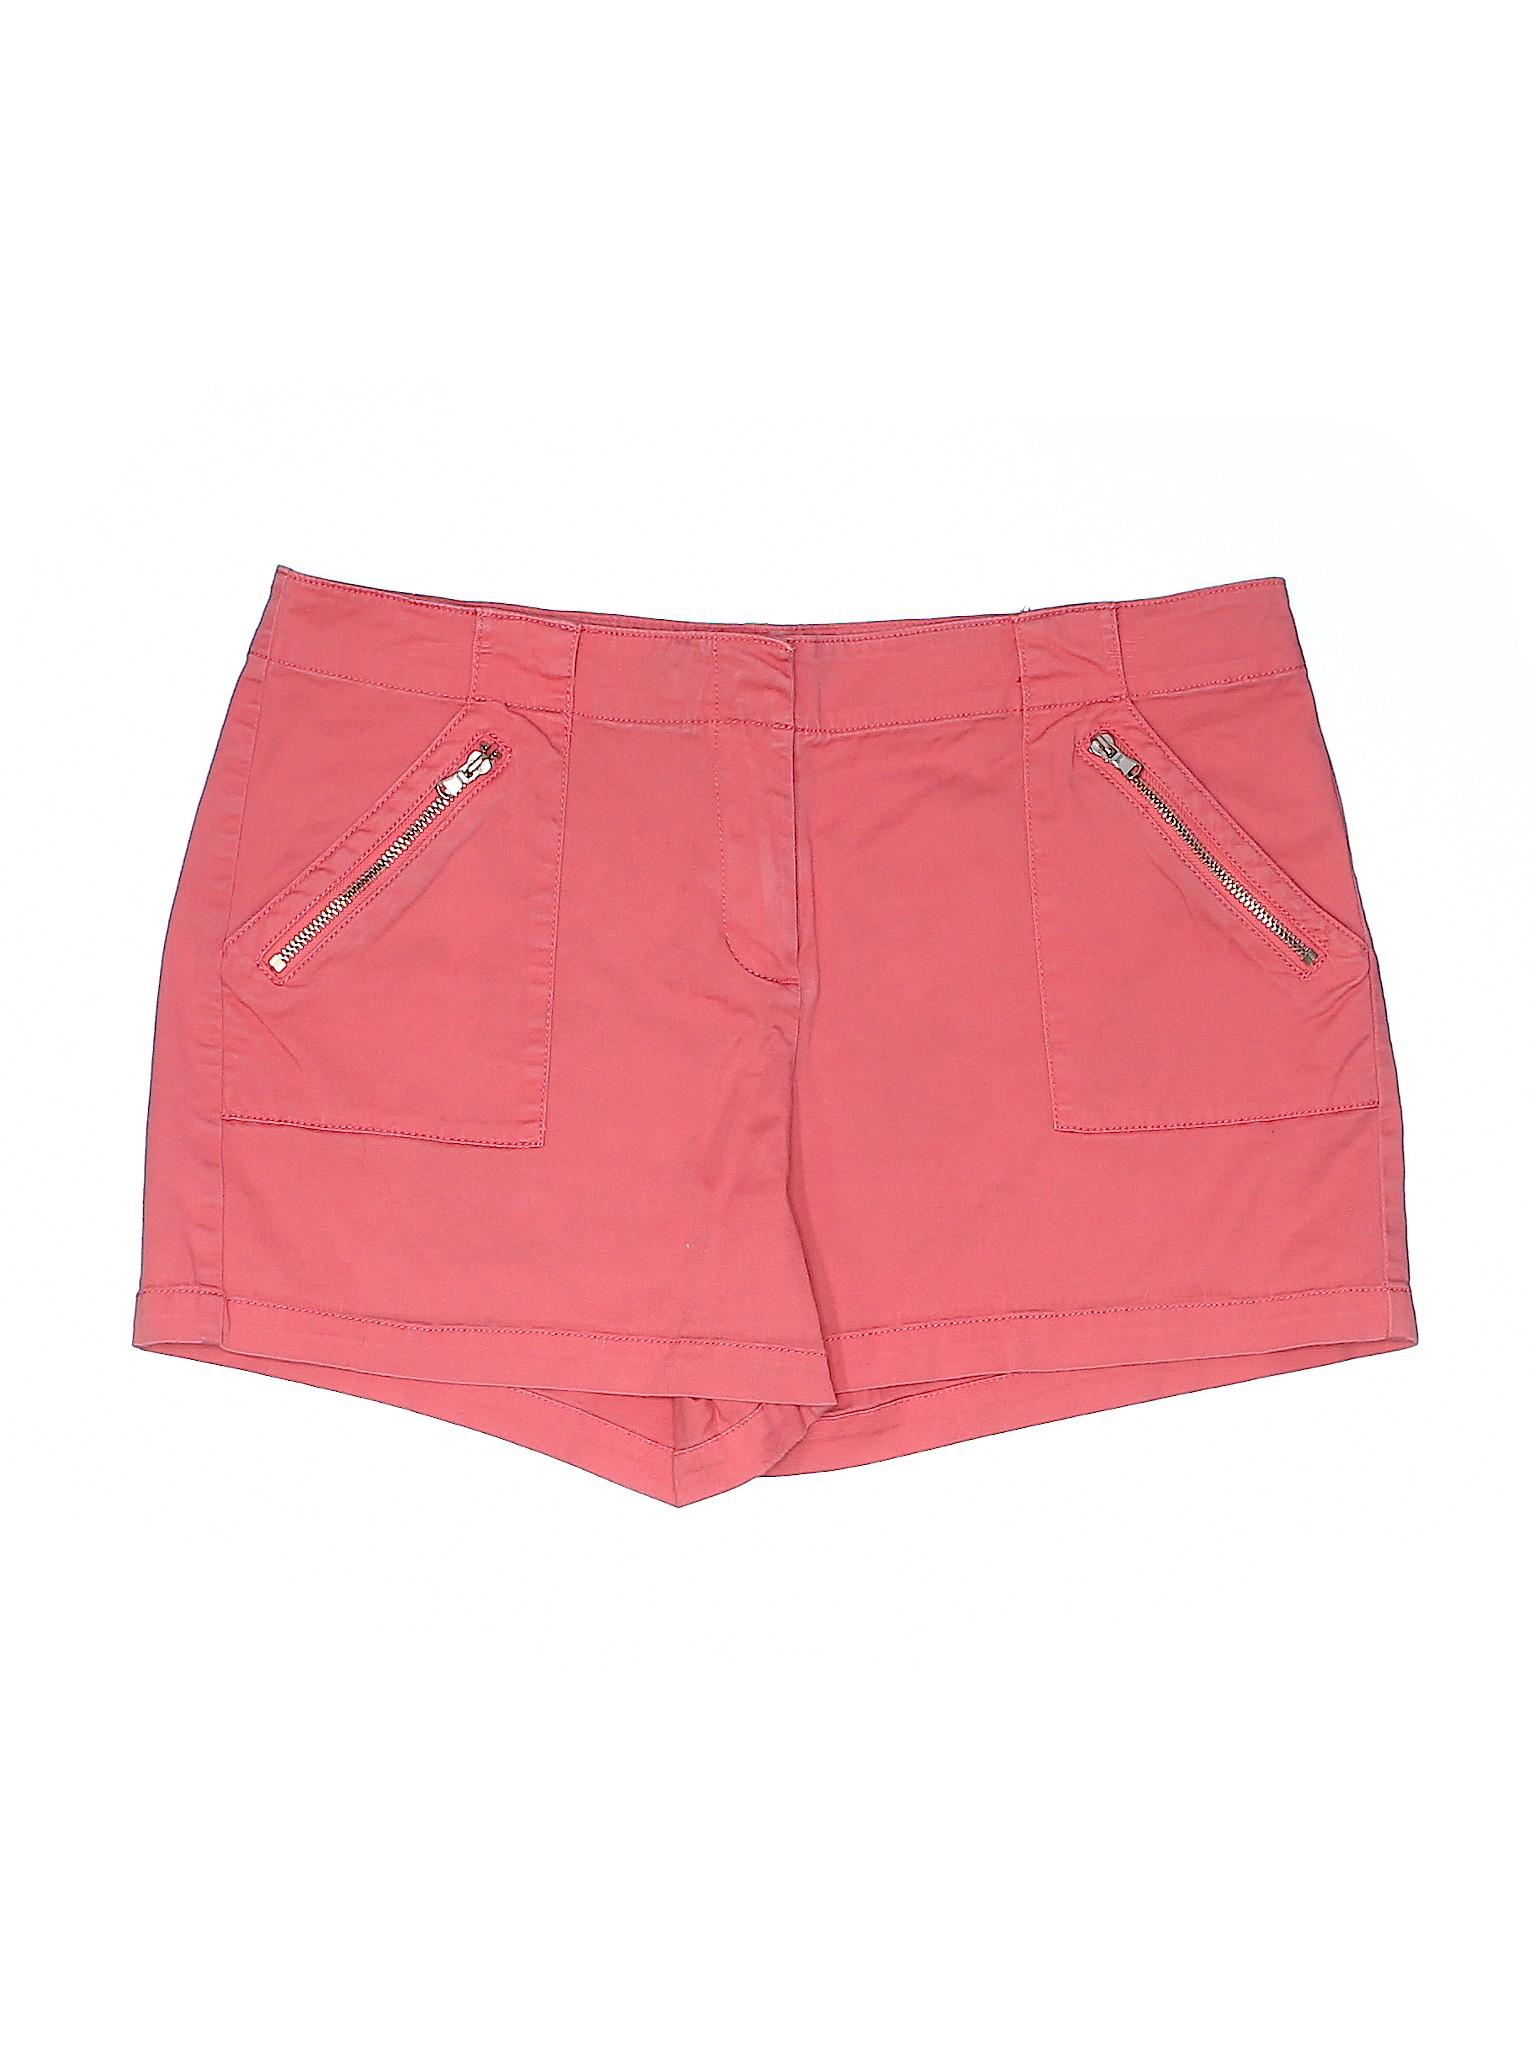 New amp; Khaki Shorts York Leisure winter Company q0ptA